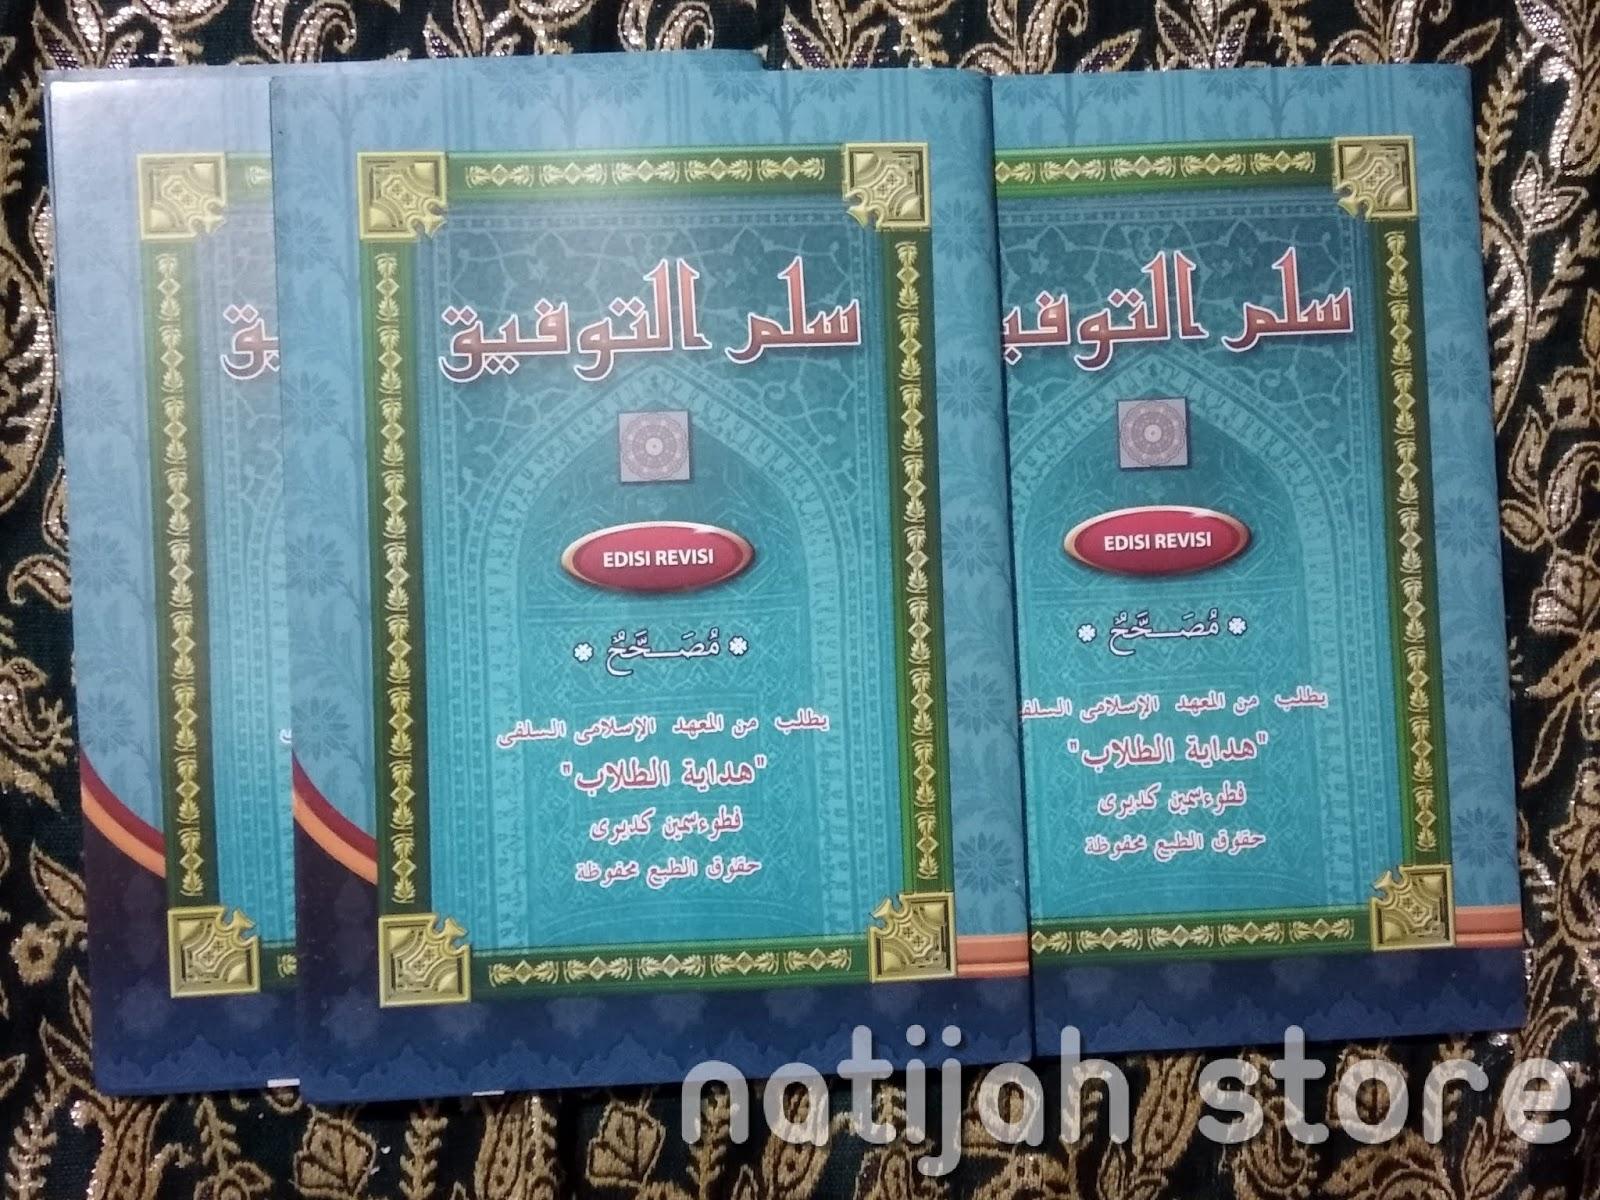 Kitab Sulam Taufiq